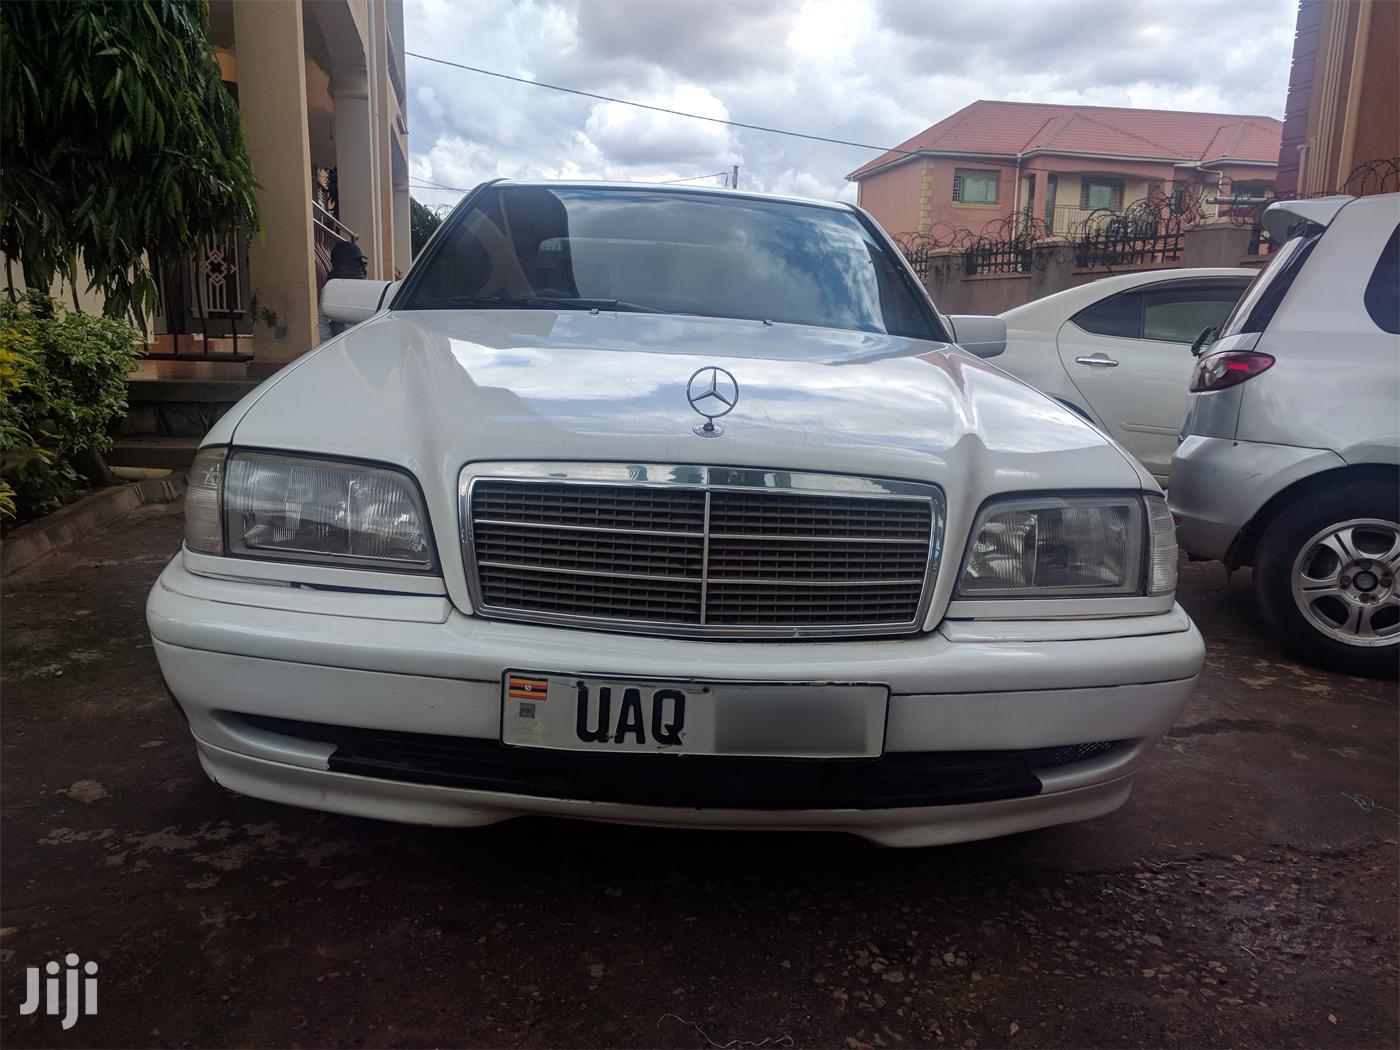 Mercedes-Benz C200 1998 White | Cars for sale in Kampala, Central Region, Uganda